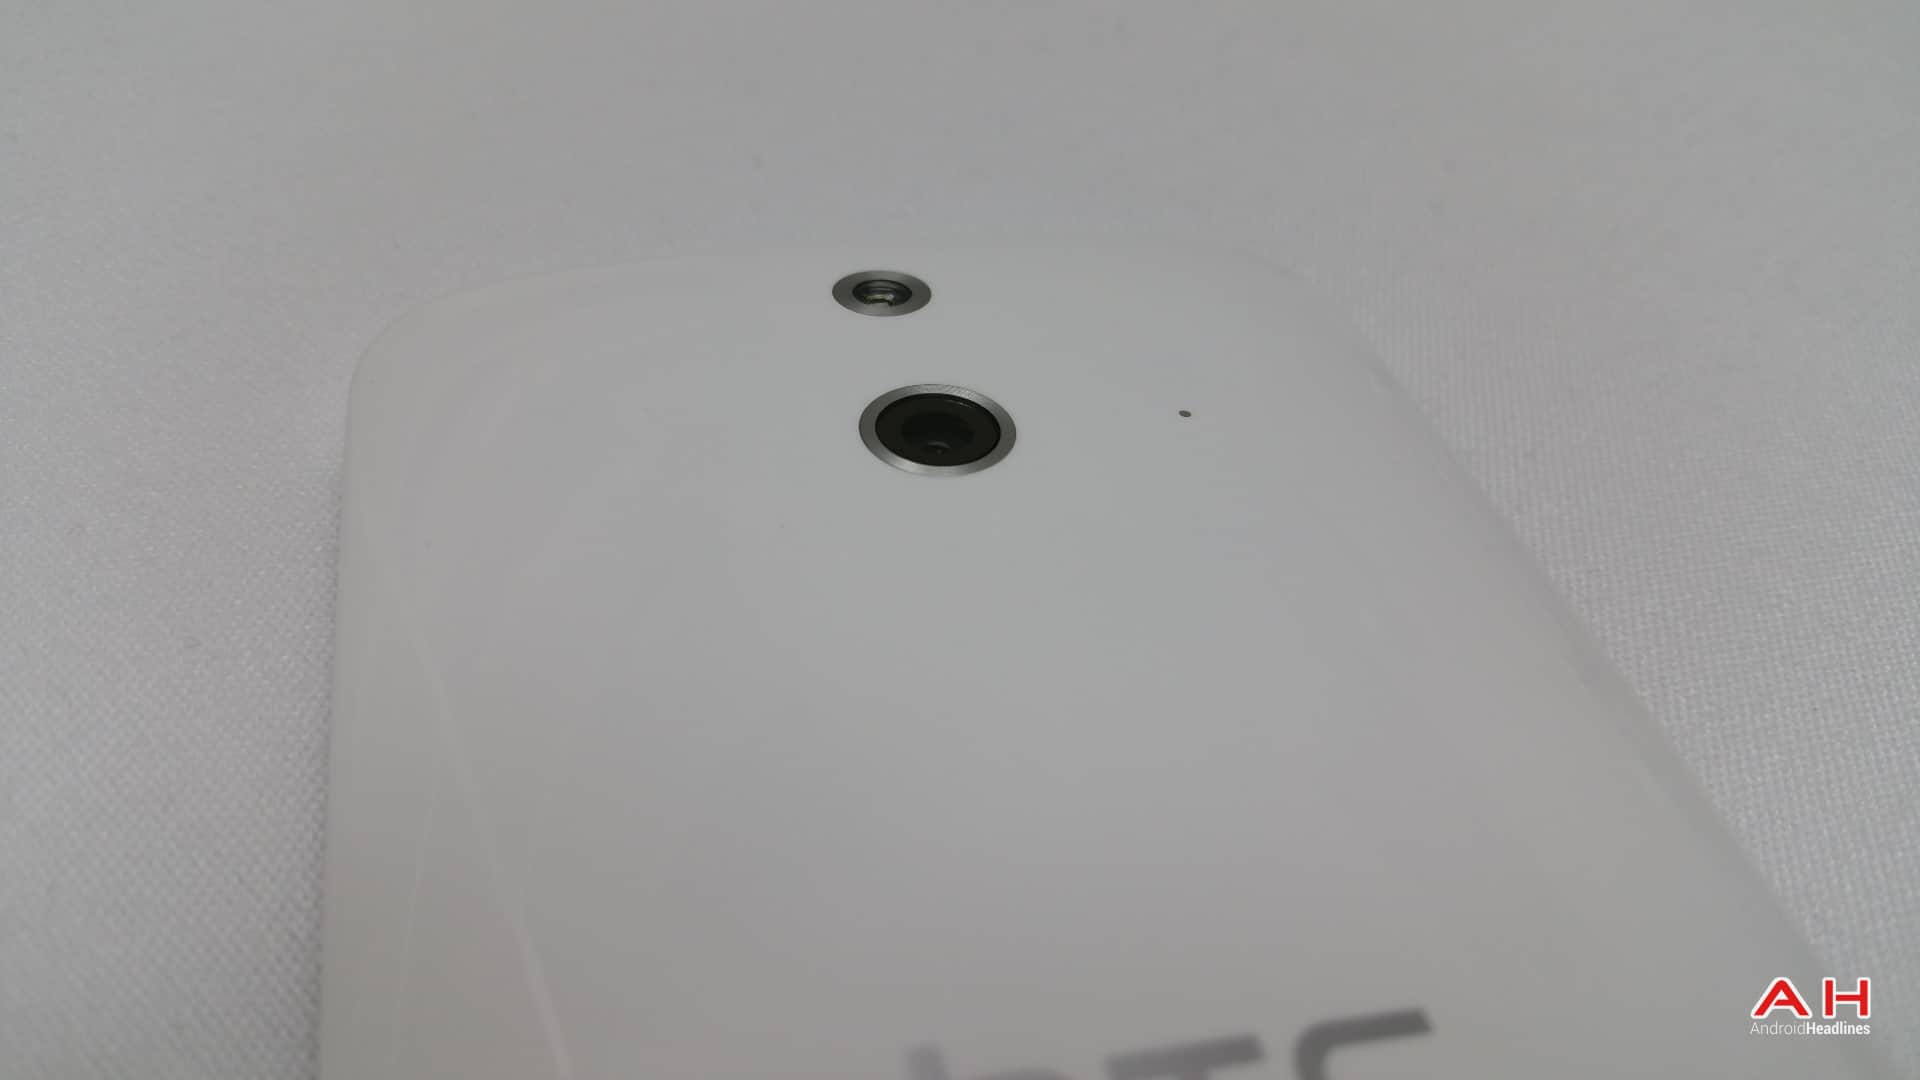 AH HTC One E8 26